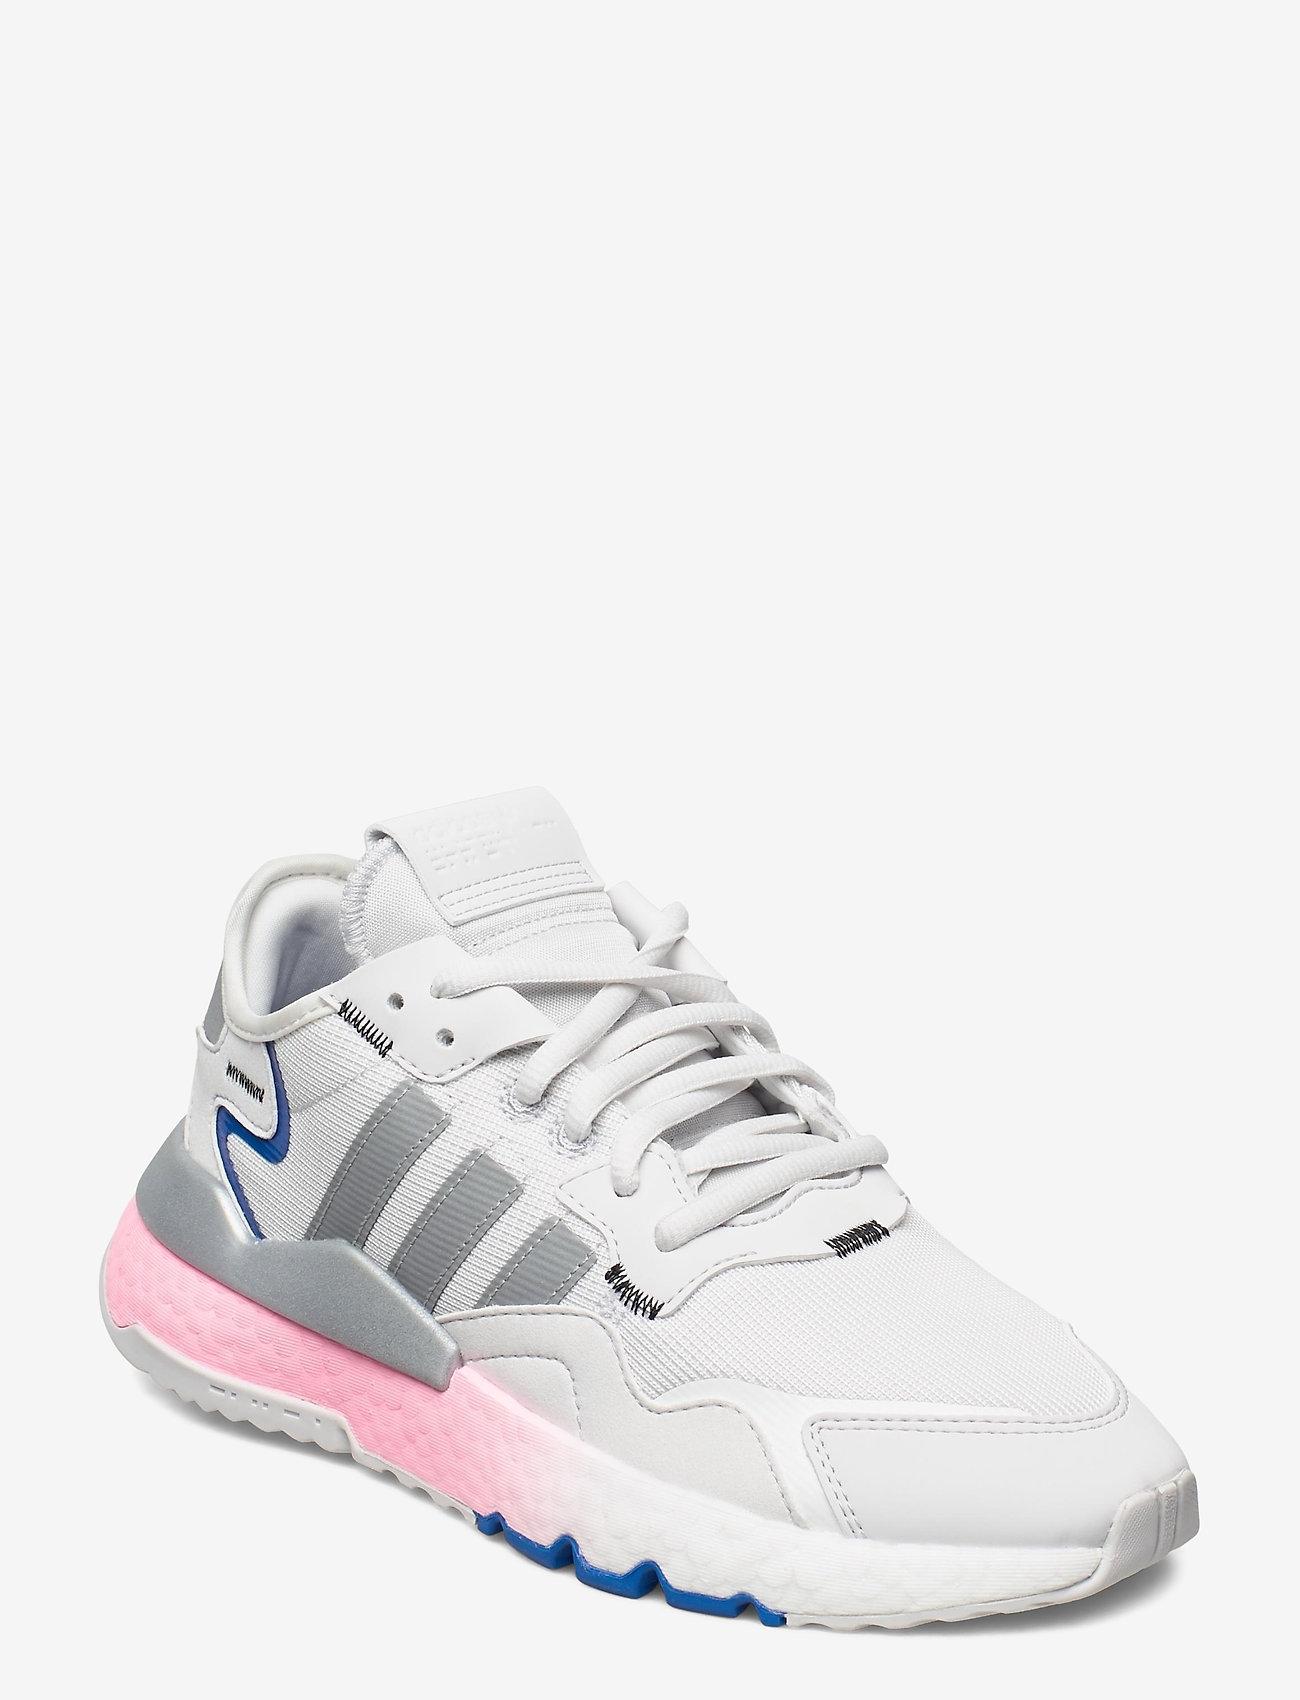 adidas Originals - NITE JOGGER W - chunky sneaker - crywht/silvmt/globlu - 0